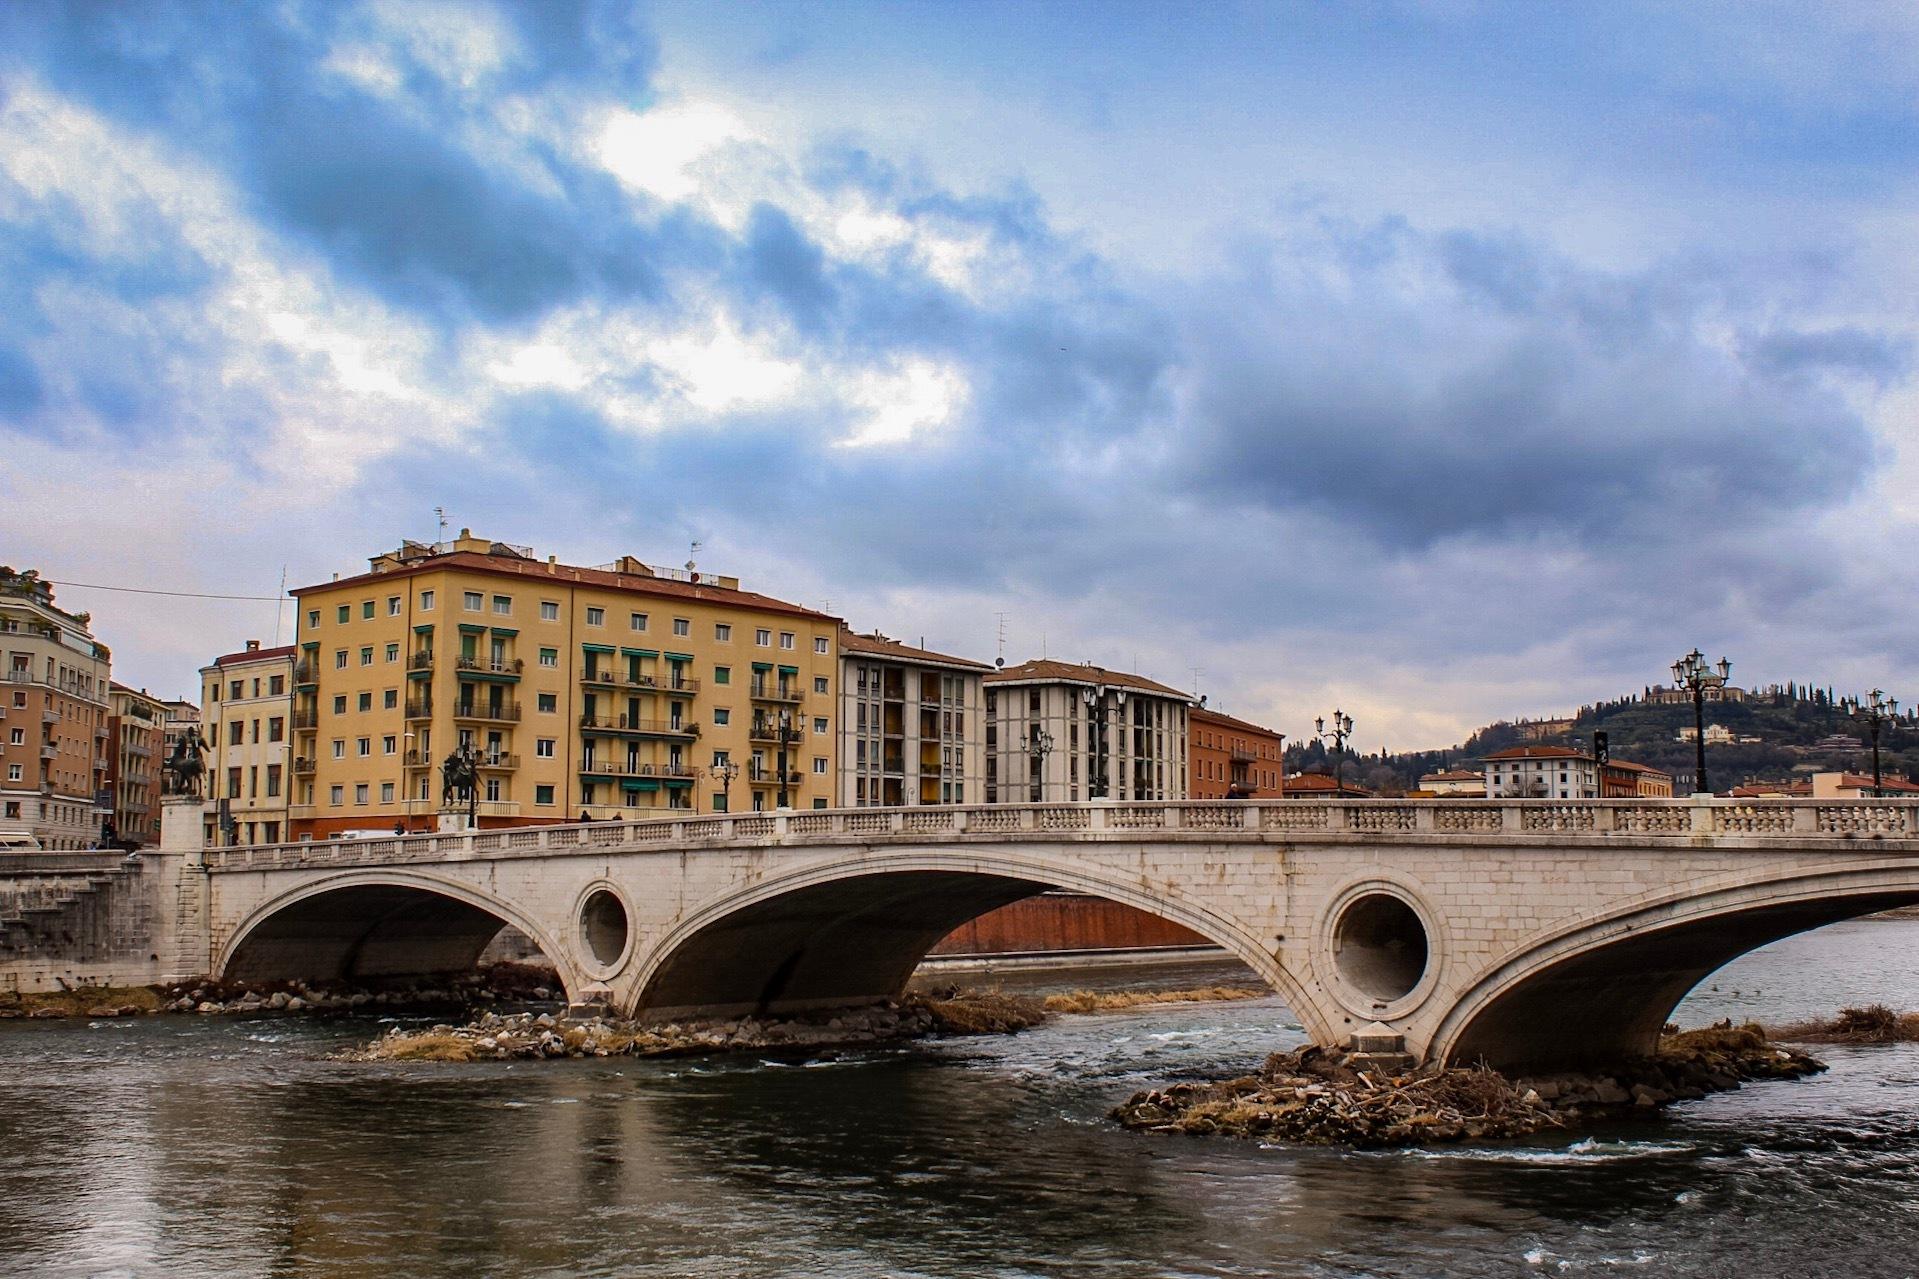 The Bridge by Guilherme Marsiglia